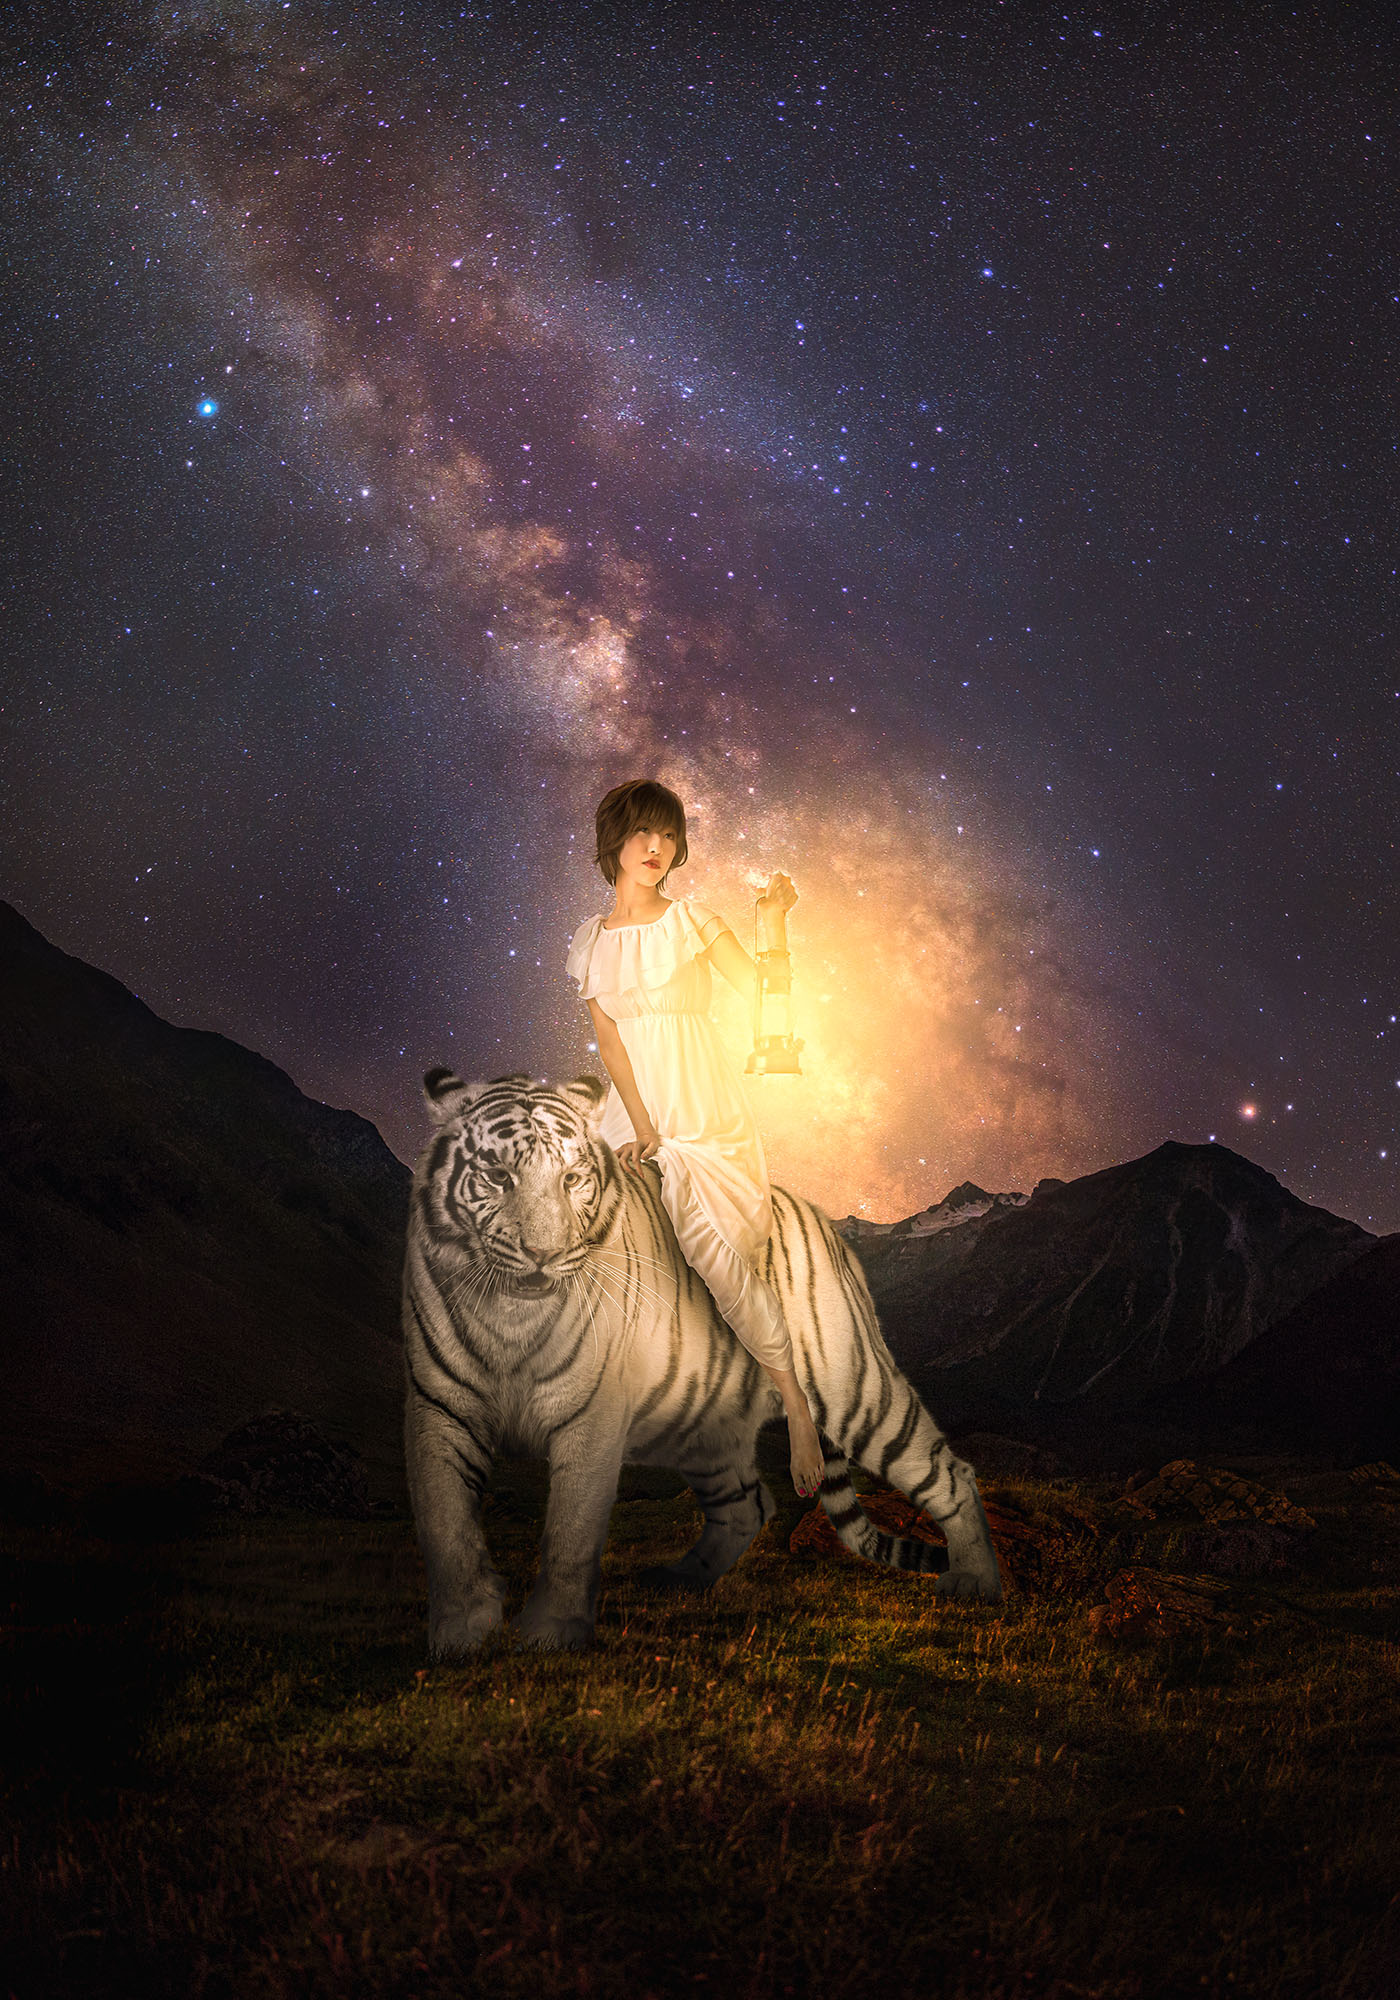 unreal, photo, photography, woman, manipulation, ポートレート、写真、女性、合成写真、天の川、トラ, milkyway, tiger